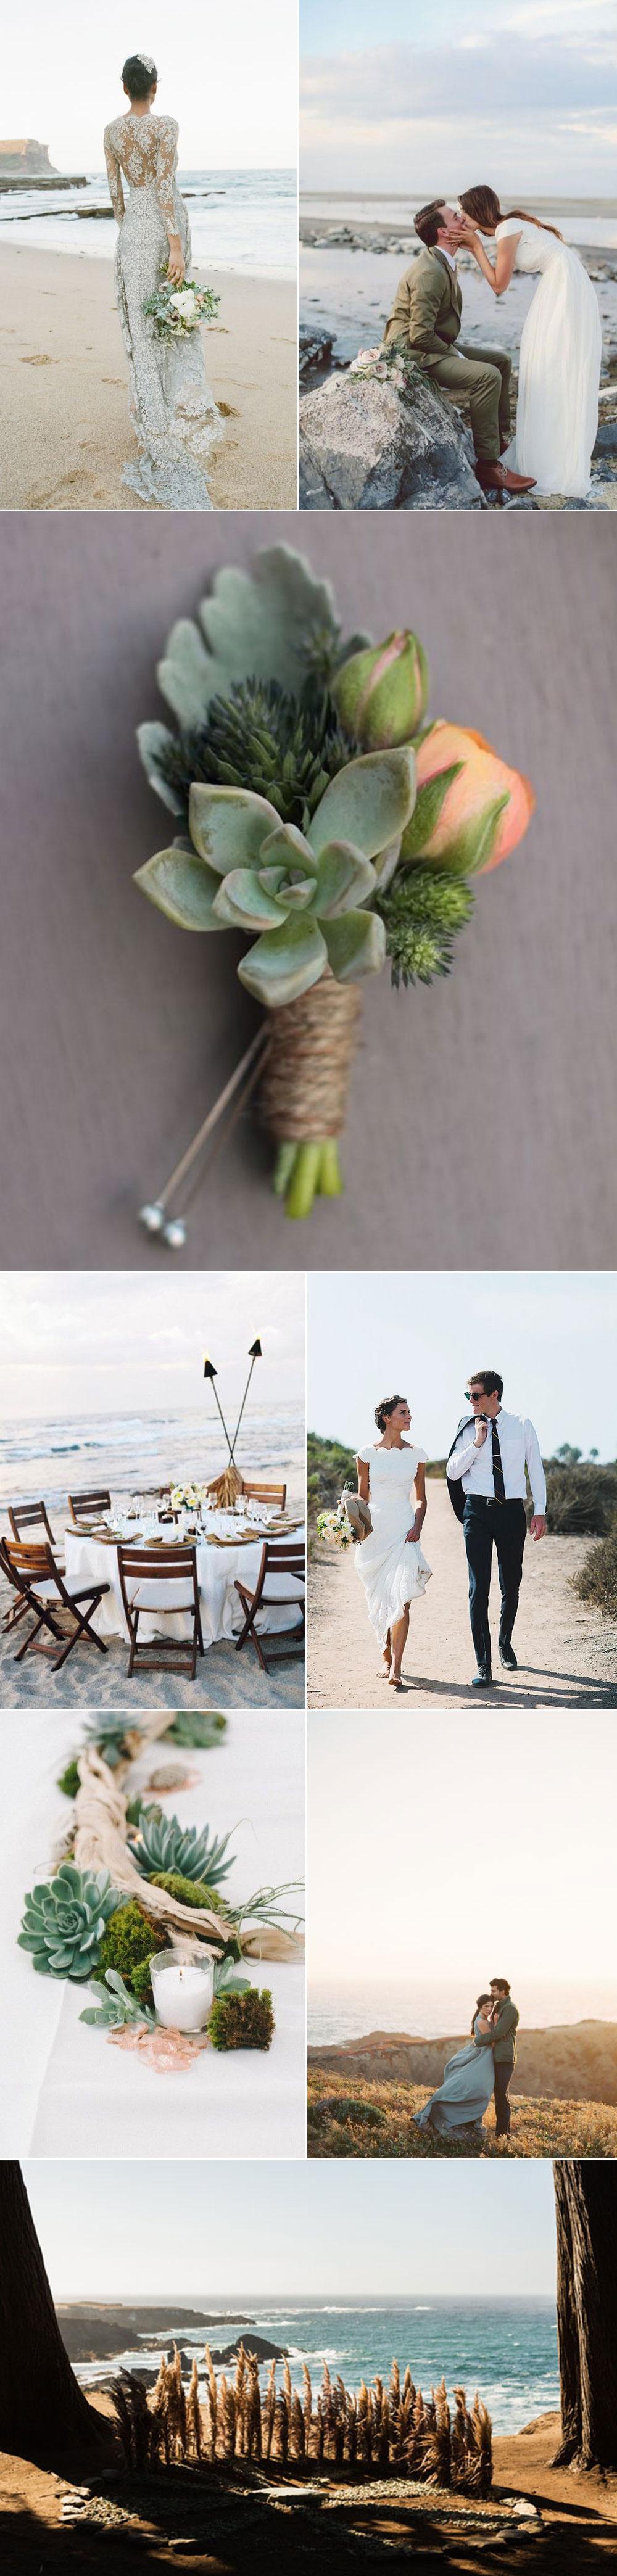 Inspiration for Coastal Wedding